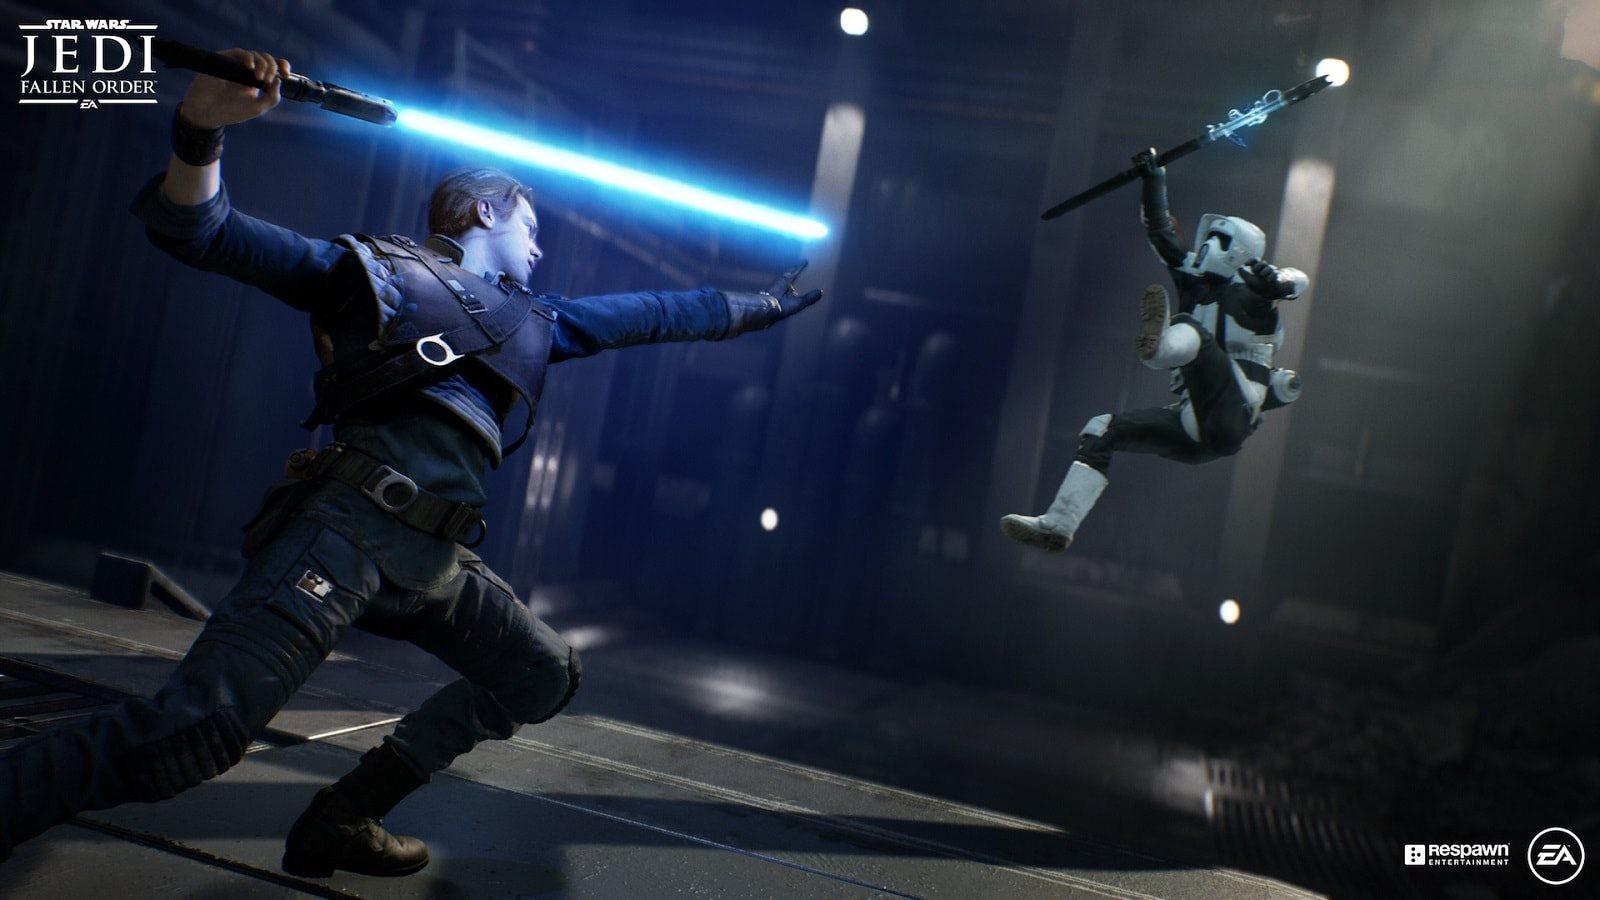 Star Wars Jedi: Fallen Order; screenshot: souboj